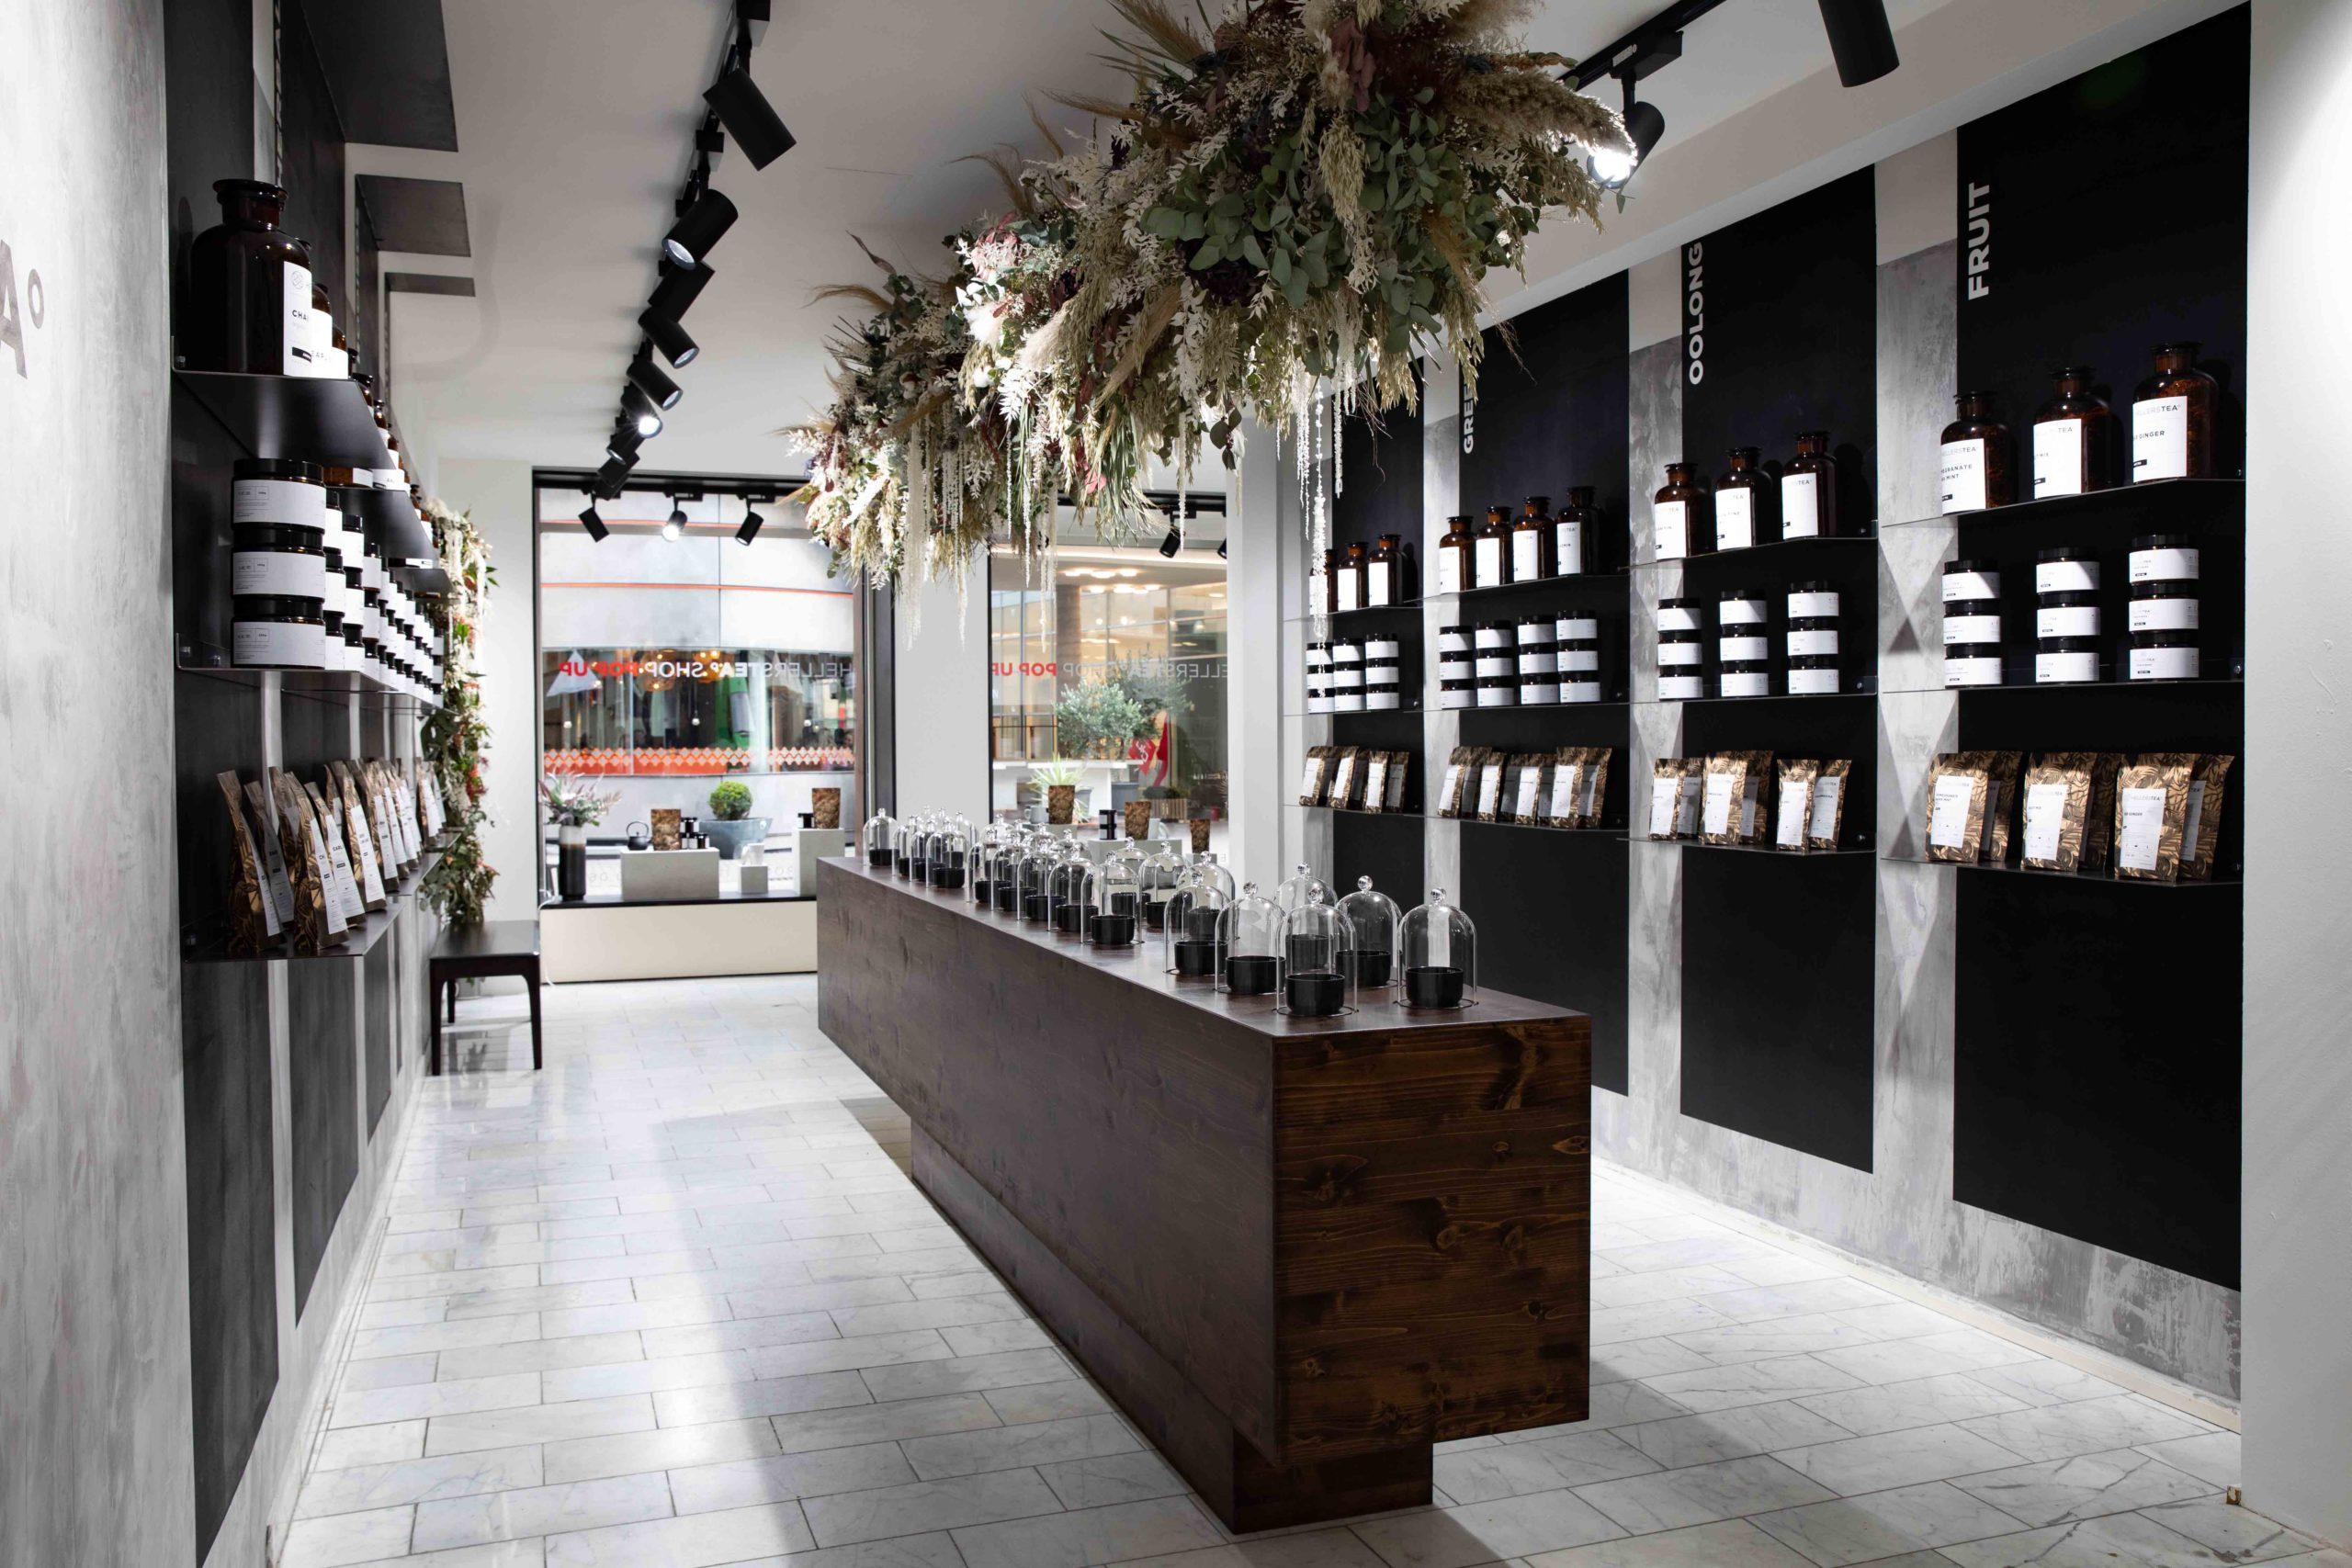 Räumlichkeit Hellers Tea Shop Nobla Raumausstattung